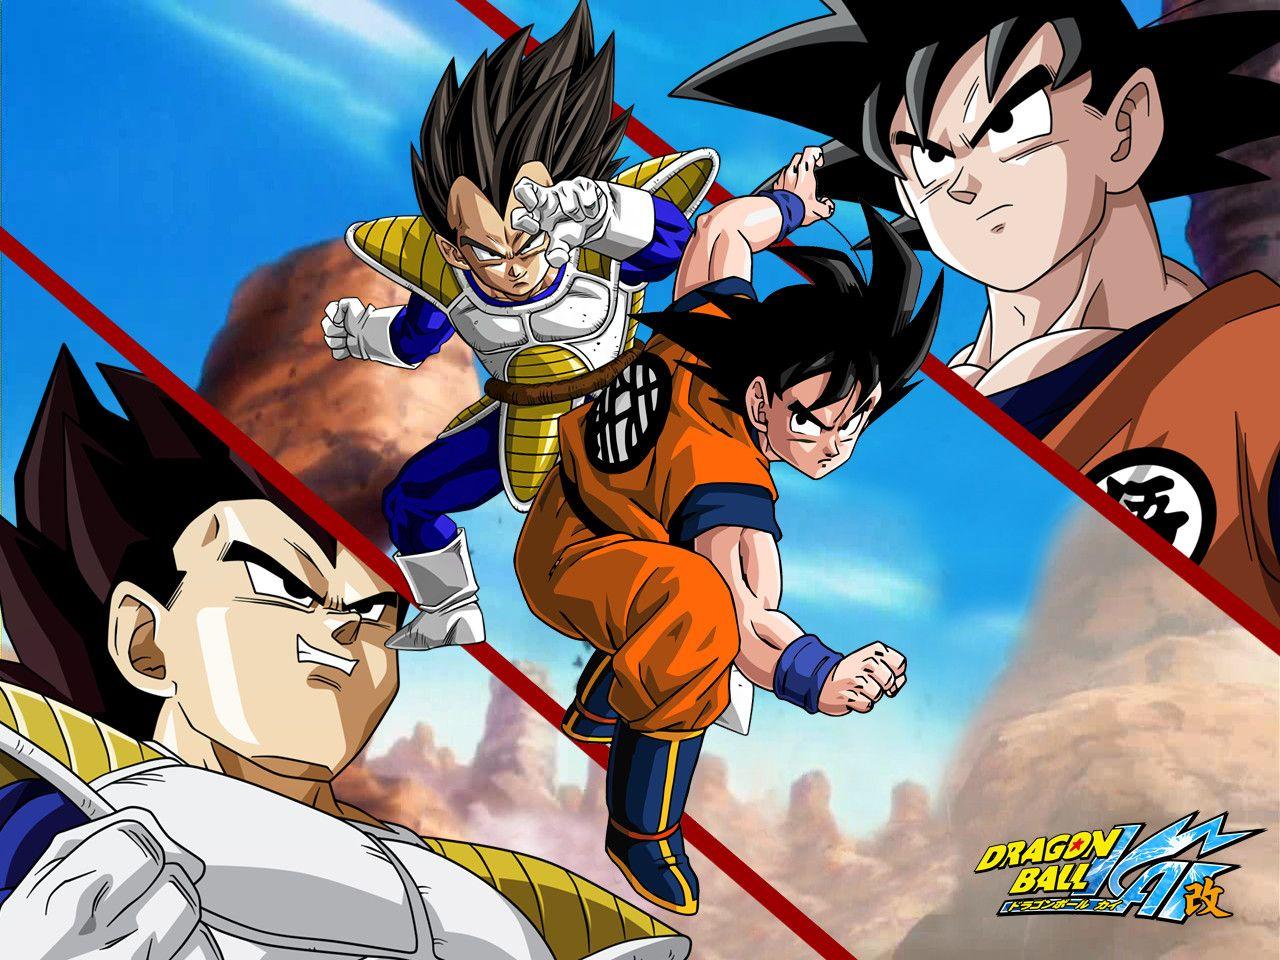 Wallpaper Goku Vs Vegeta Saiyans Saga By Dony910 On Deviantart Dragon Ball Goku Dragon Ball Art Dragon Fight